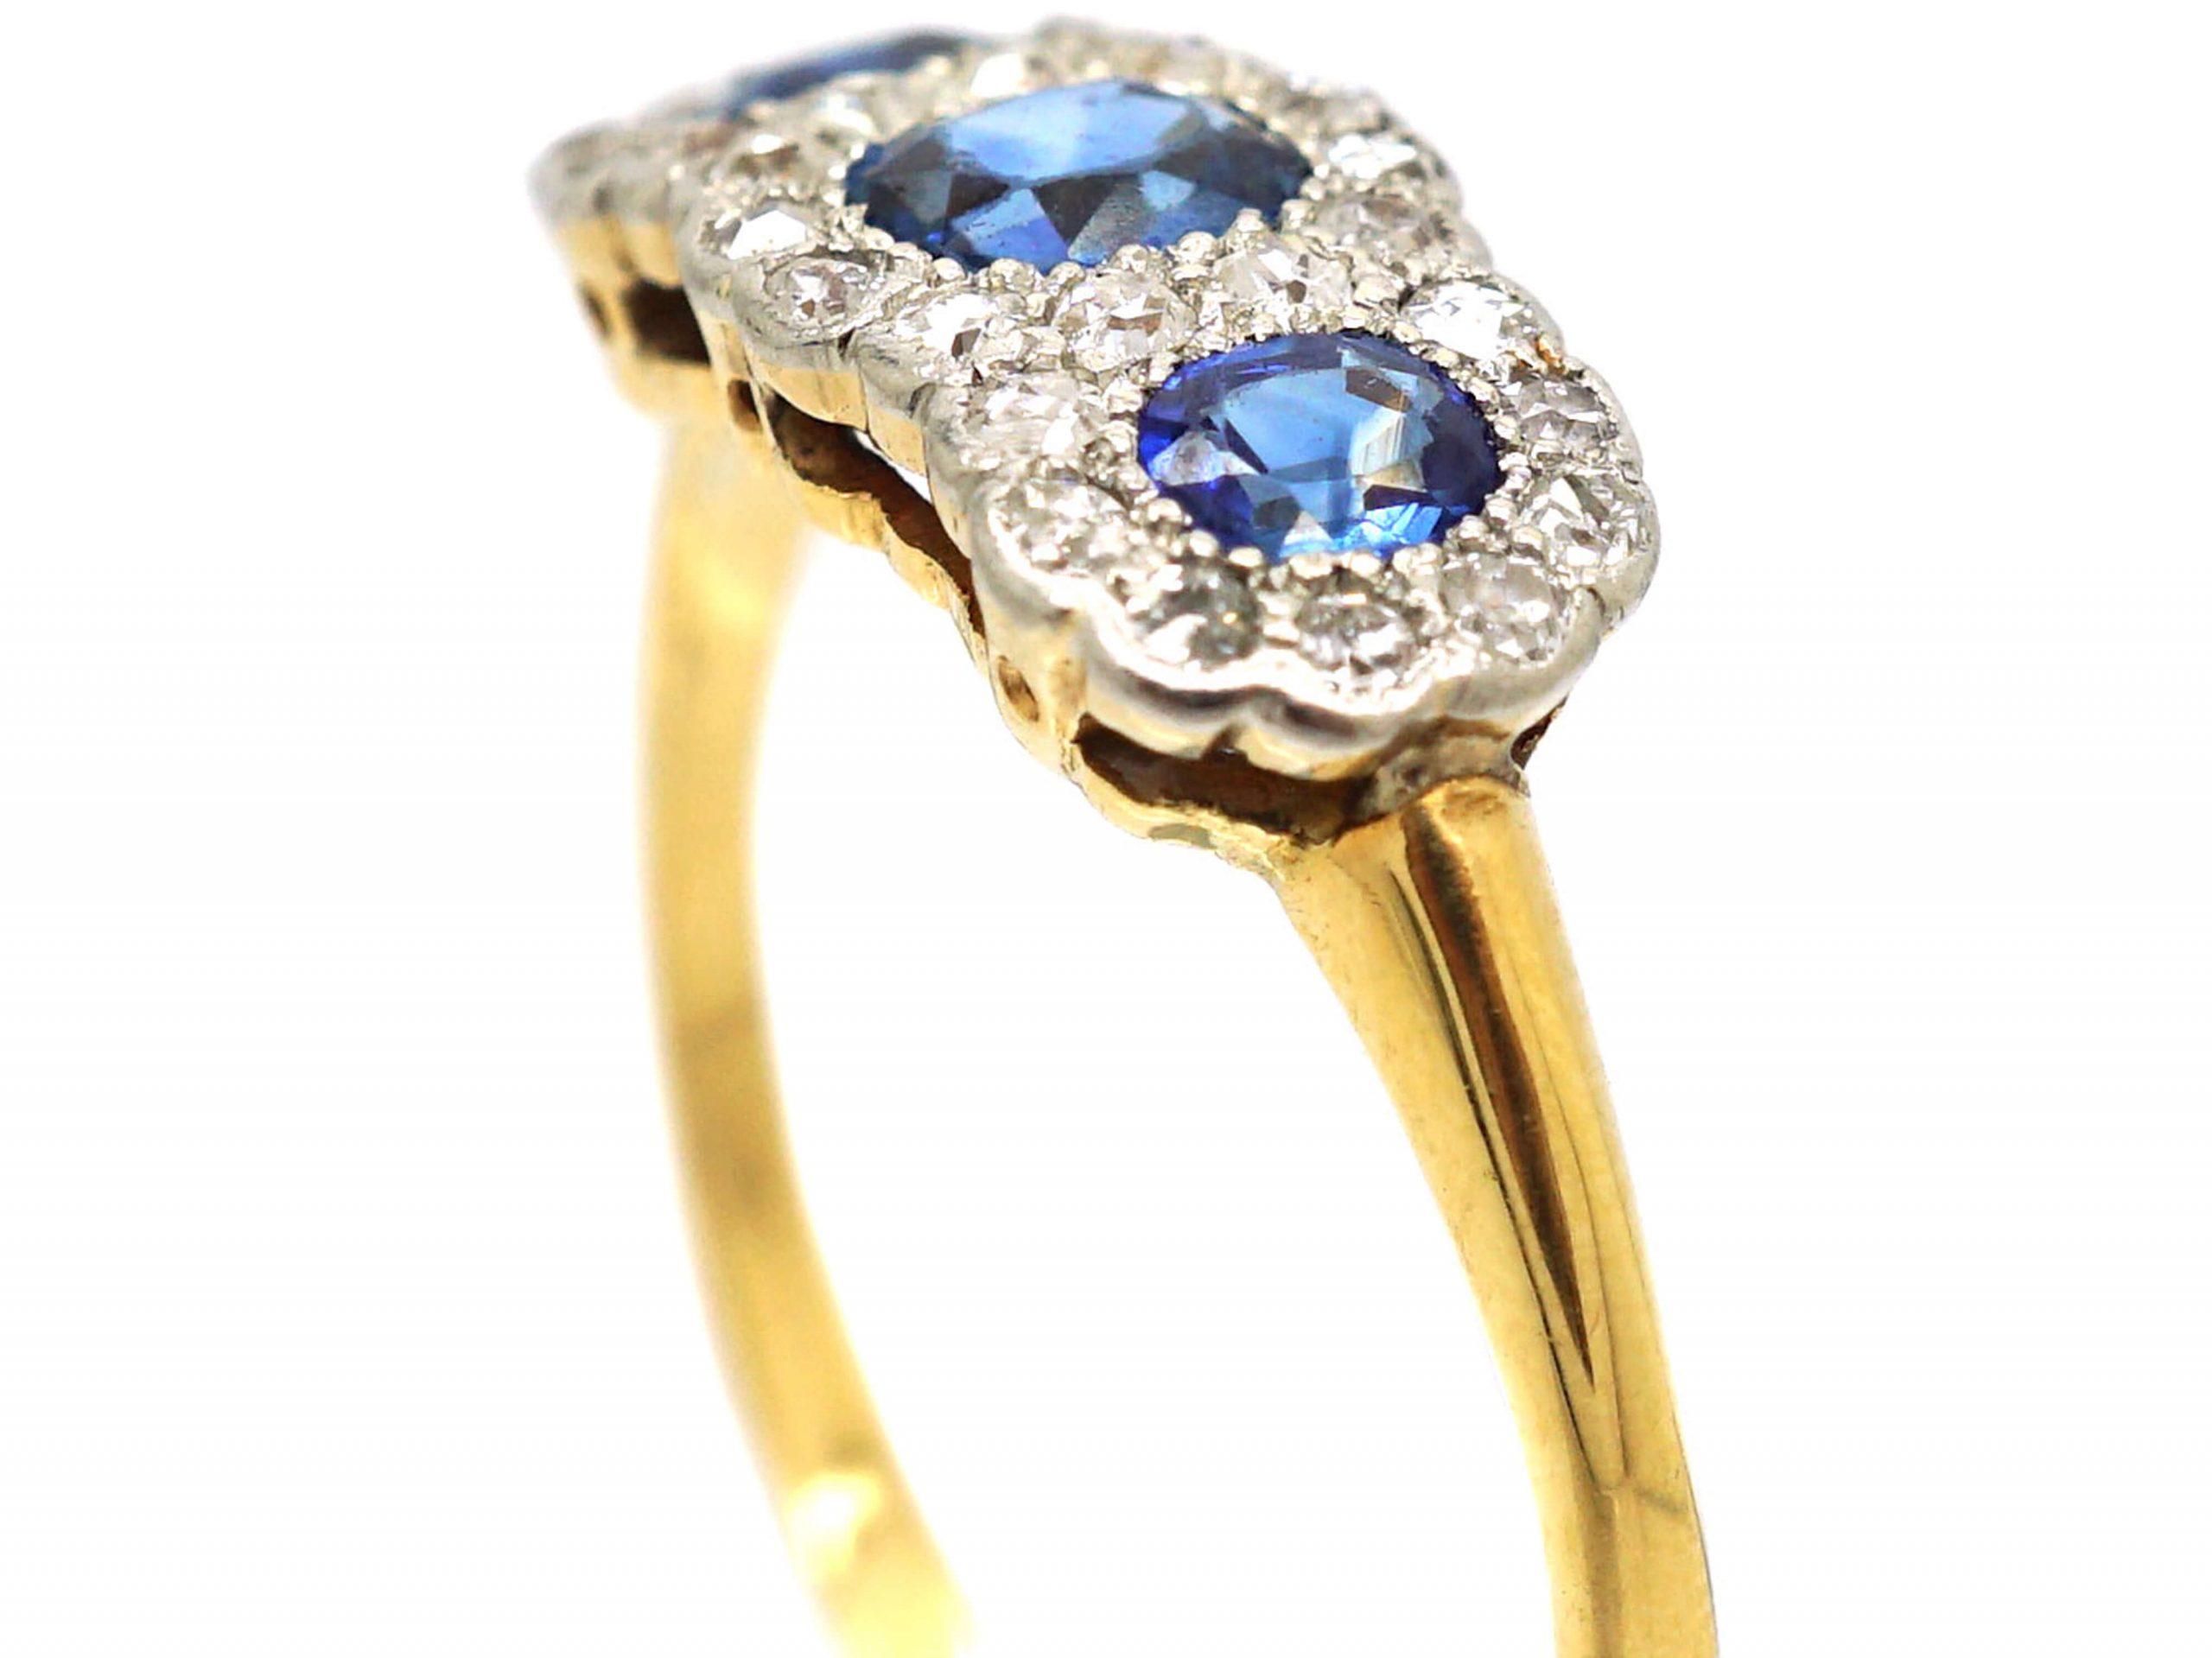 Edwardian 18ct Gold & Platinum, Triple Cluster Ring set with Sapphires & Diamonds